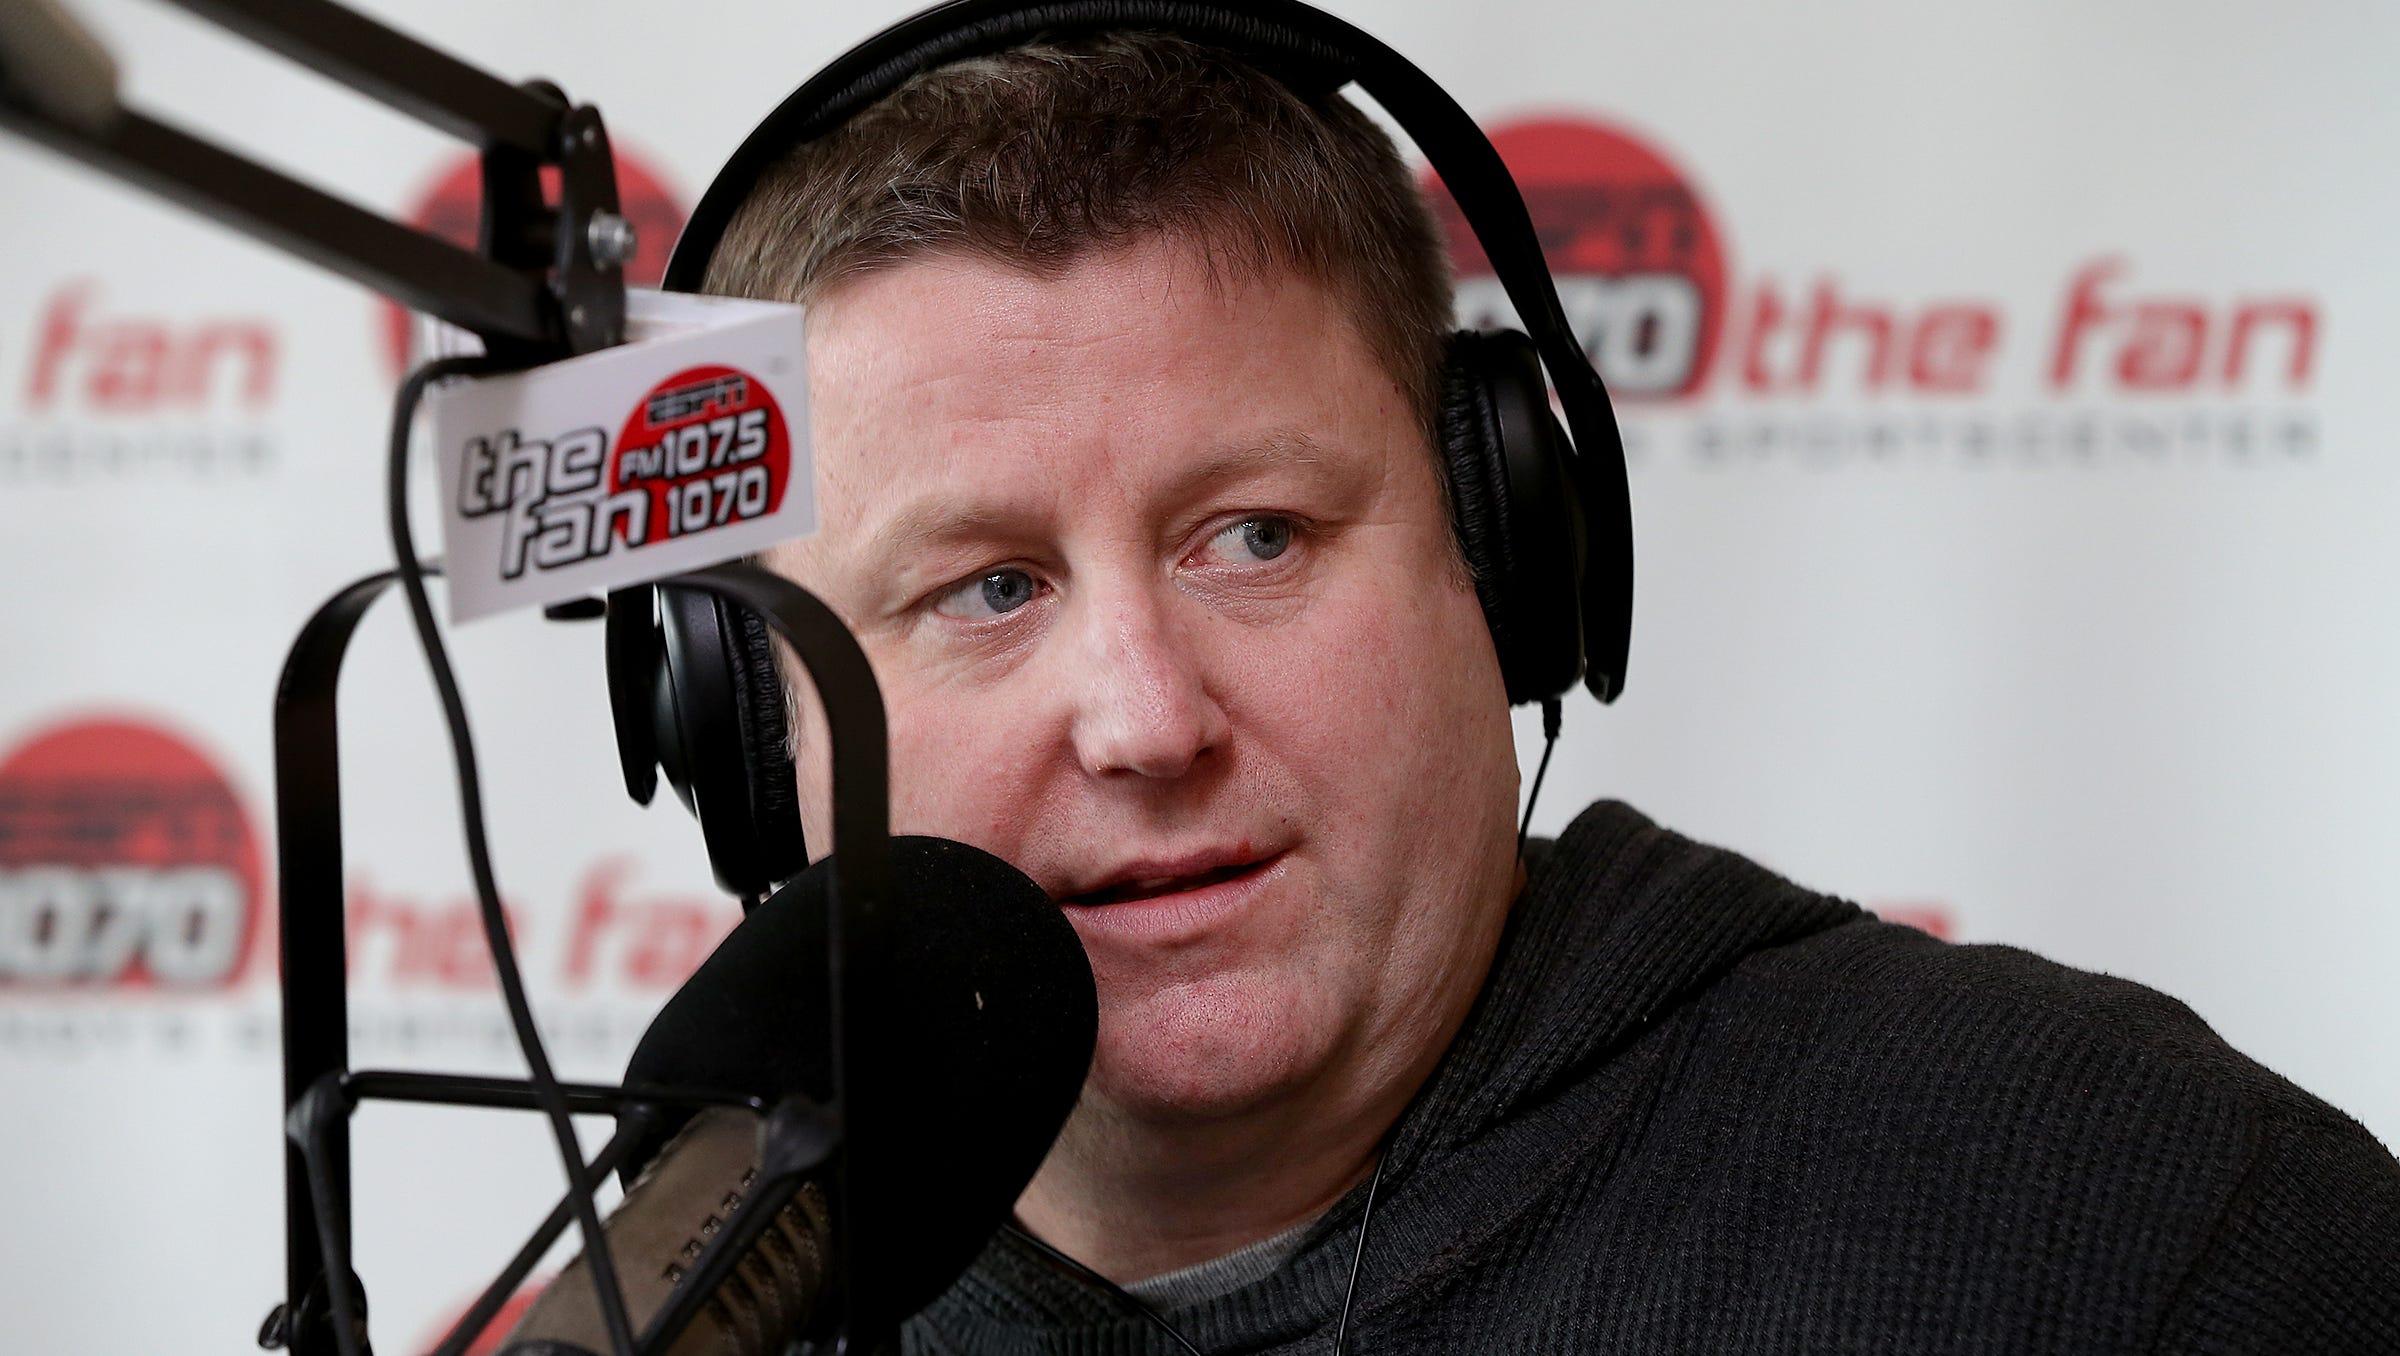 Indy S Espn The Fan Home To Dan Dakich Jmv Sports Radio Adds Station